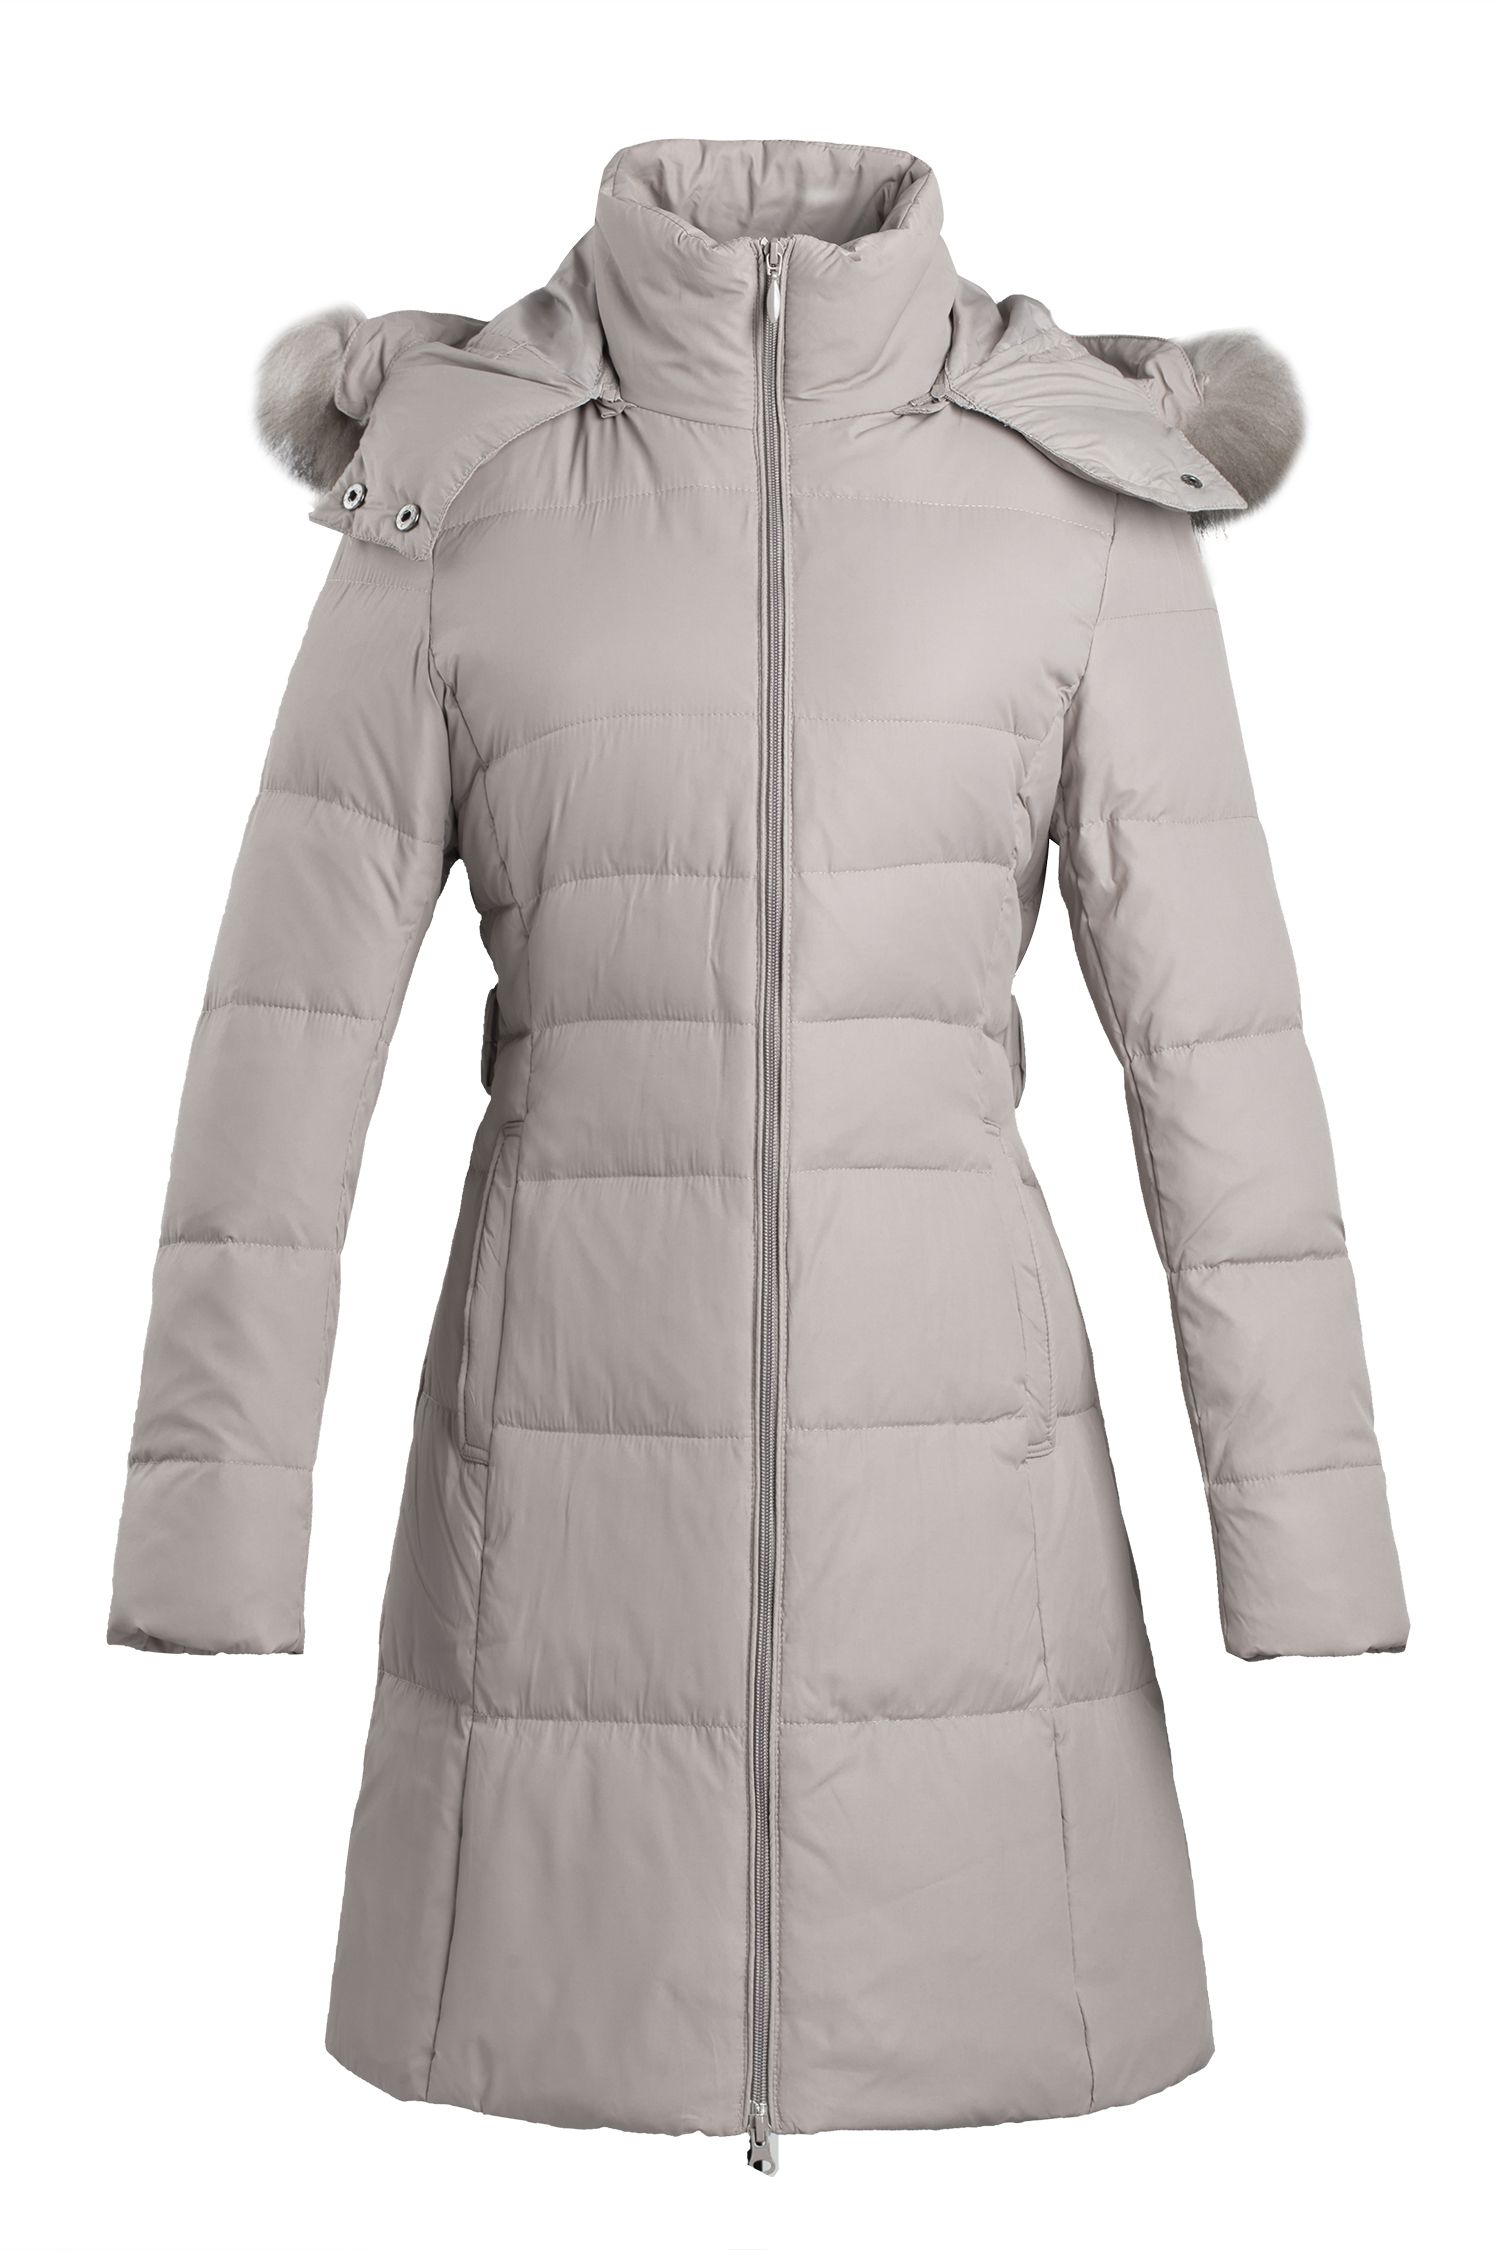 4c0924b0e Pin by ADOMI on ADOMI STYLE | Winter jackets, Coats for women, Long ...